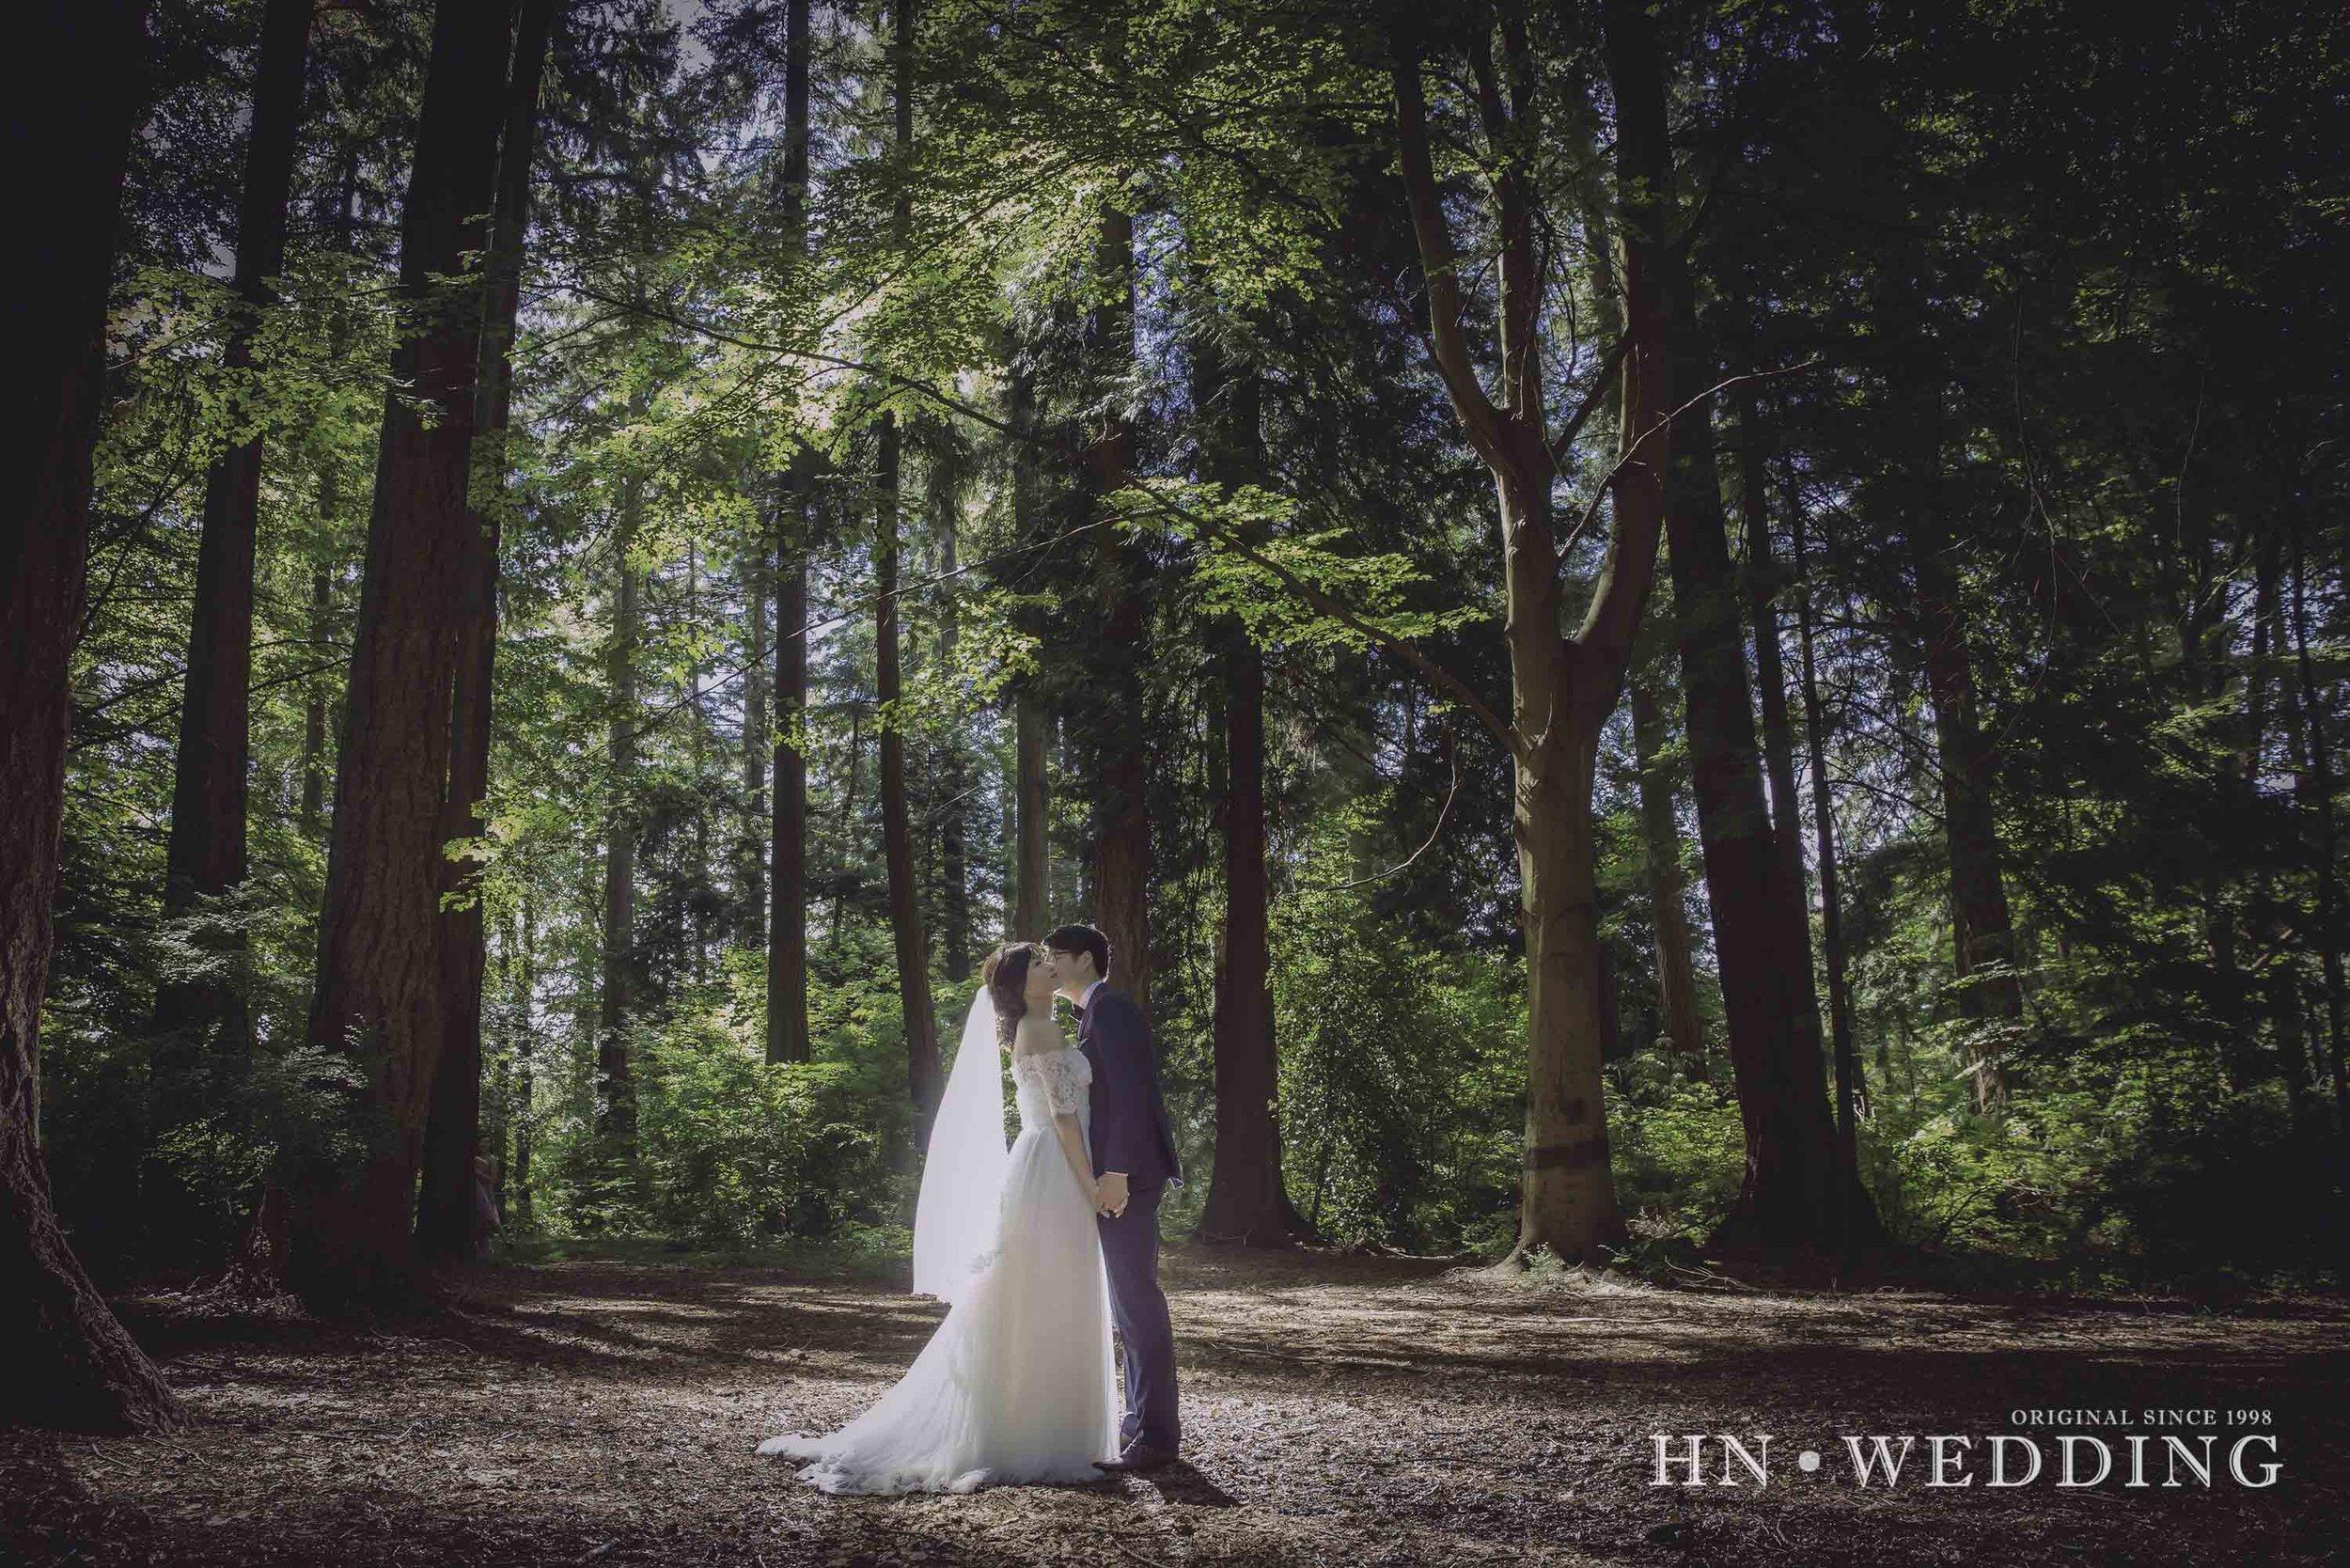 HNwedding-20160826-wedding-1405.jpg